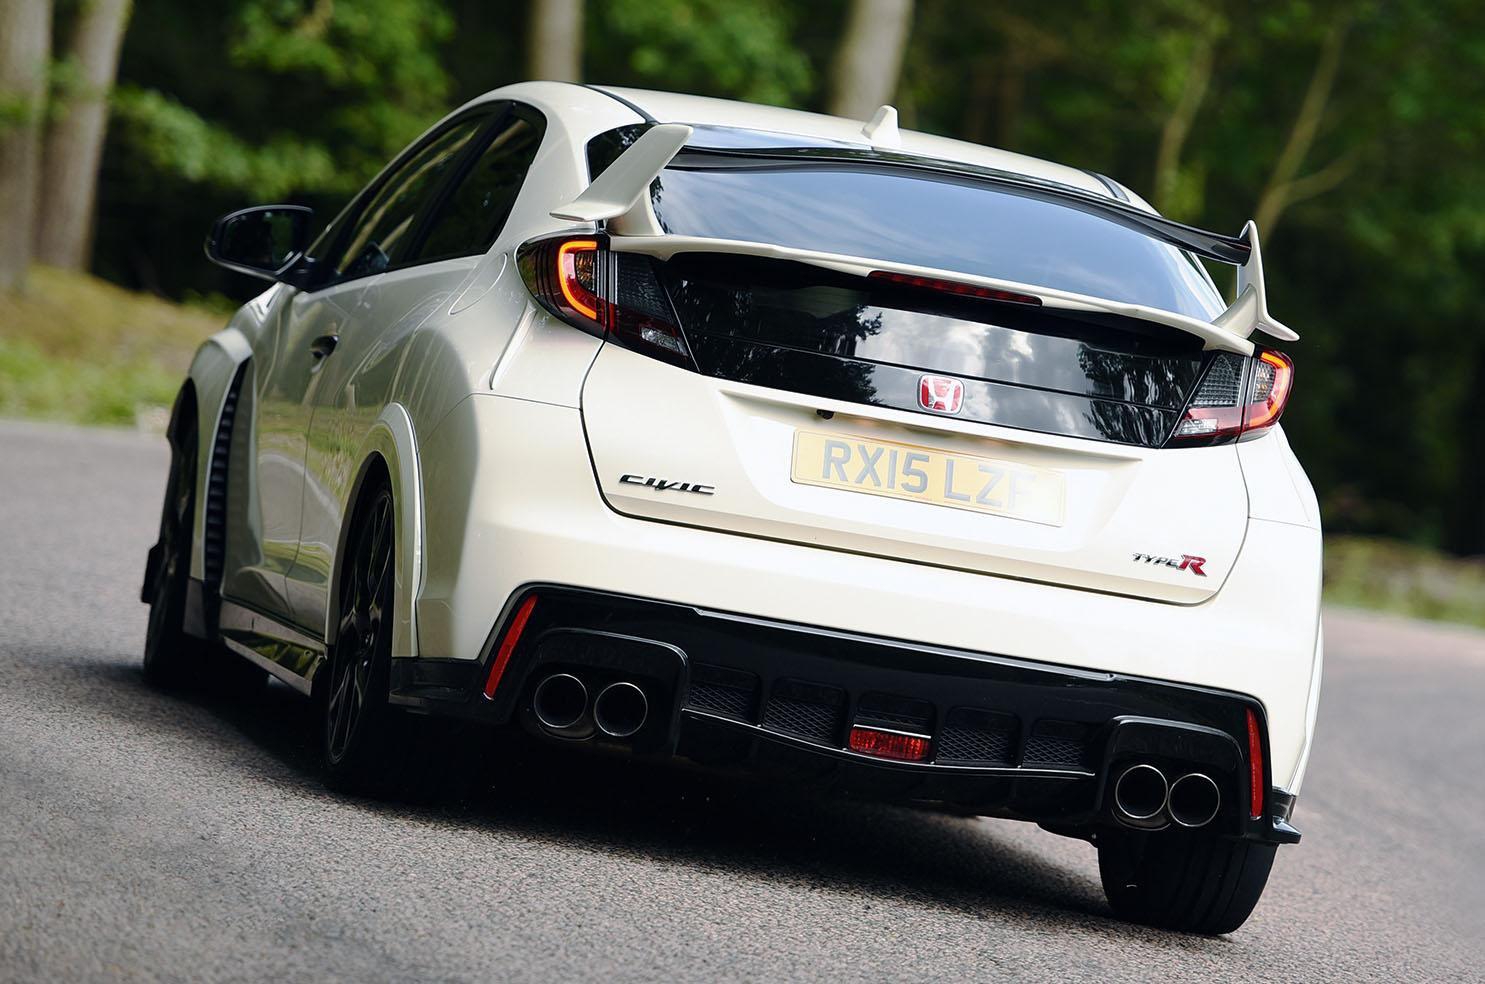 Used test: BMW M135i vs Honda Civic Type R